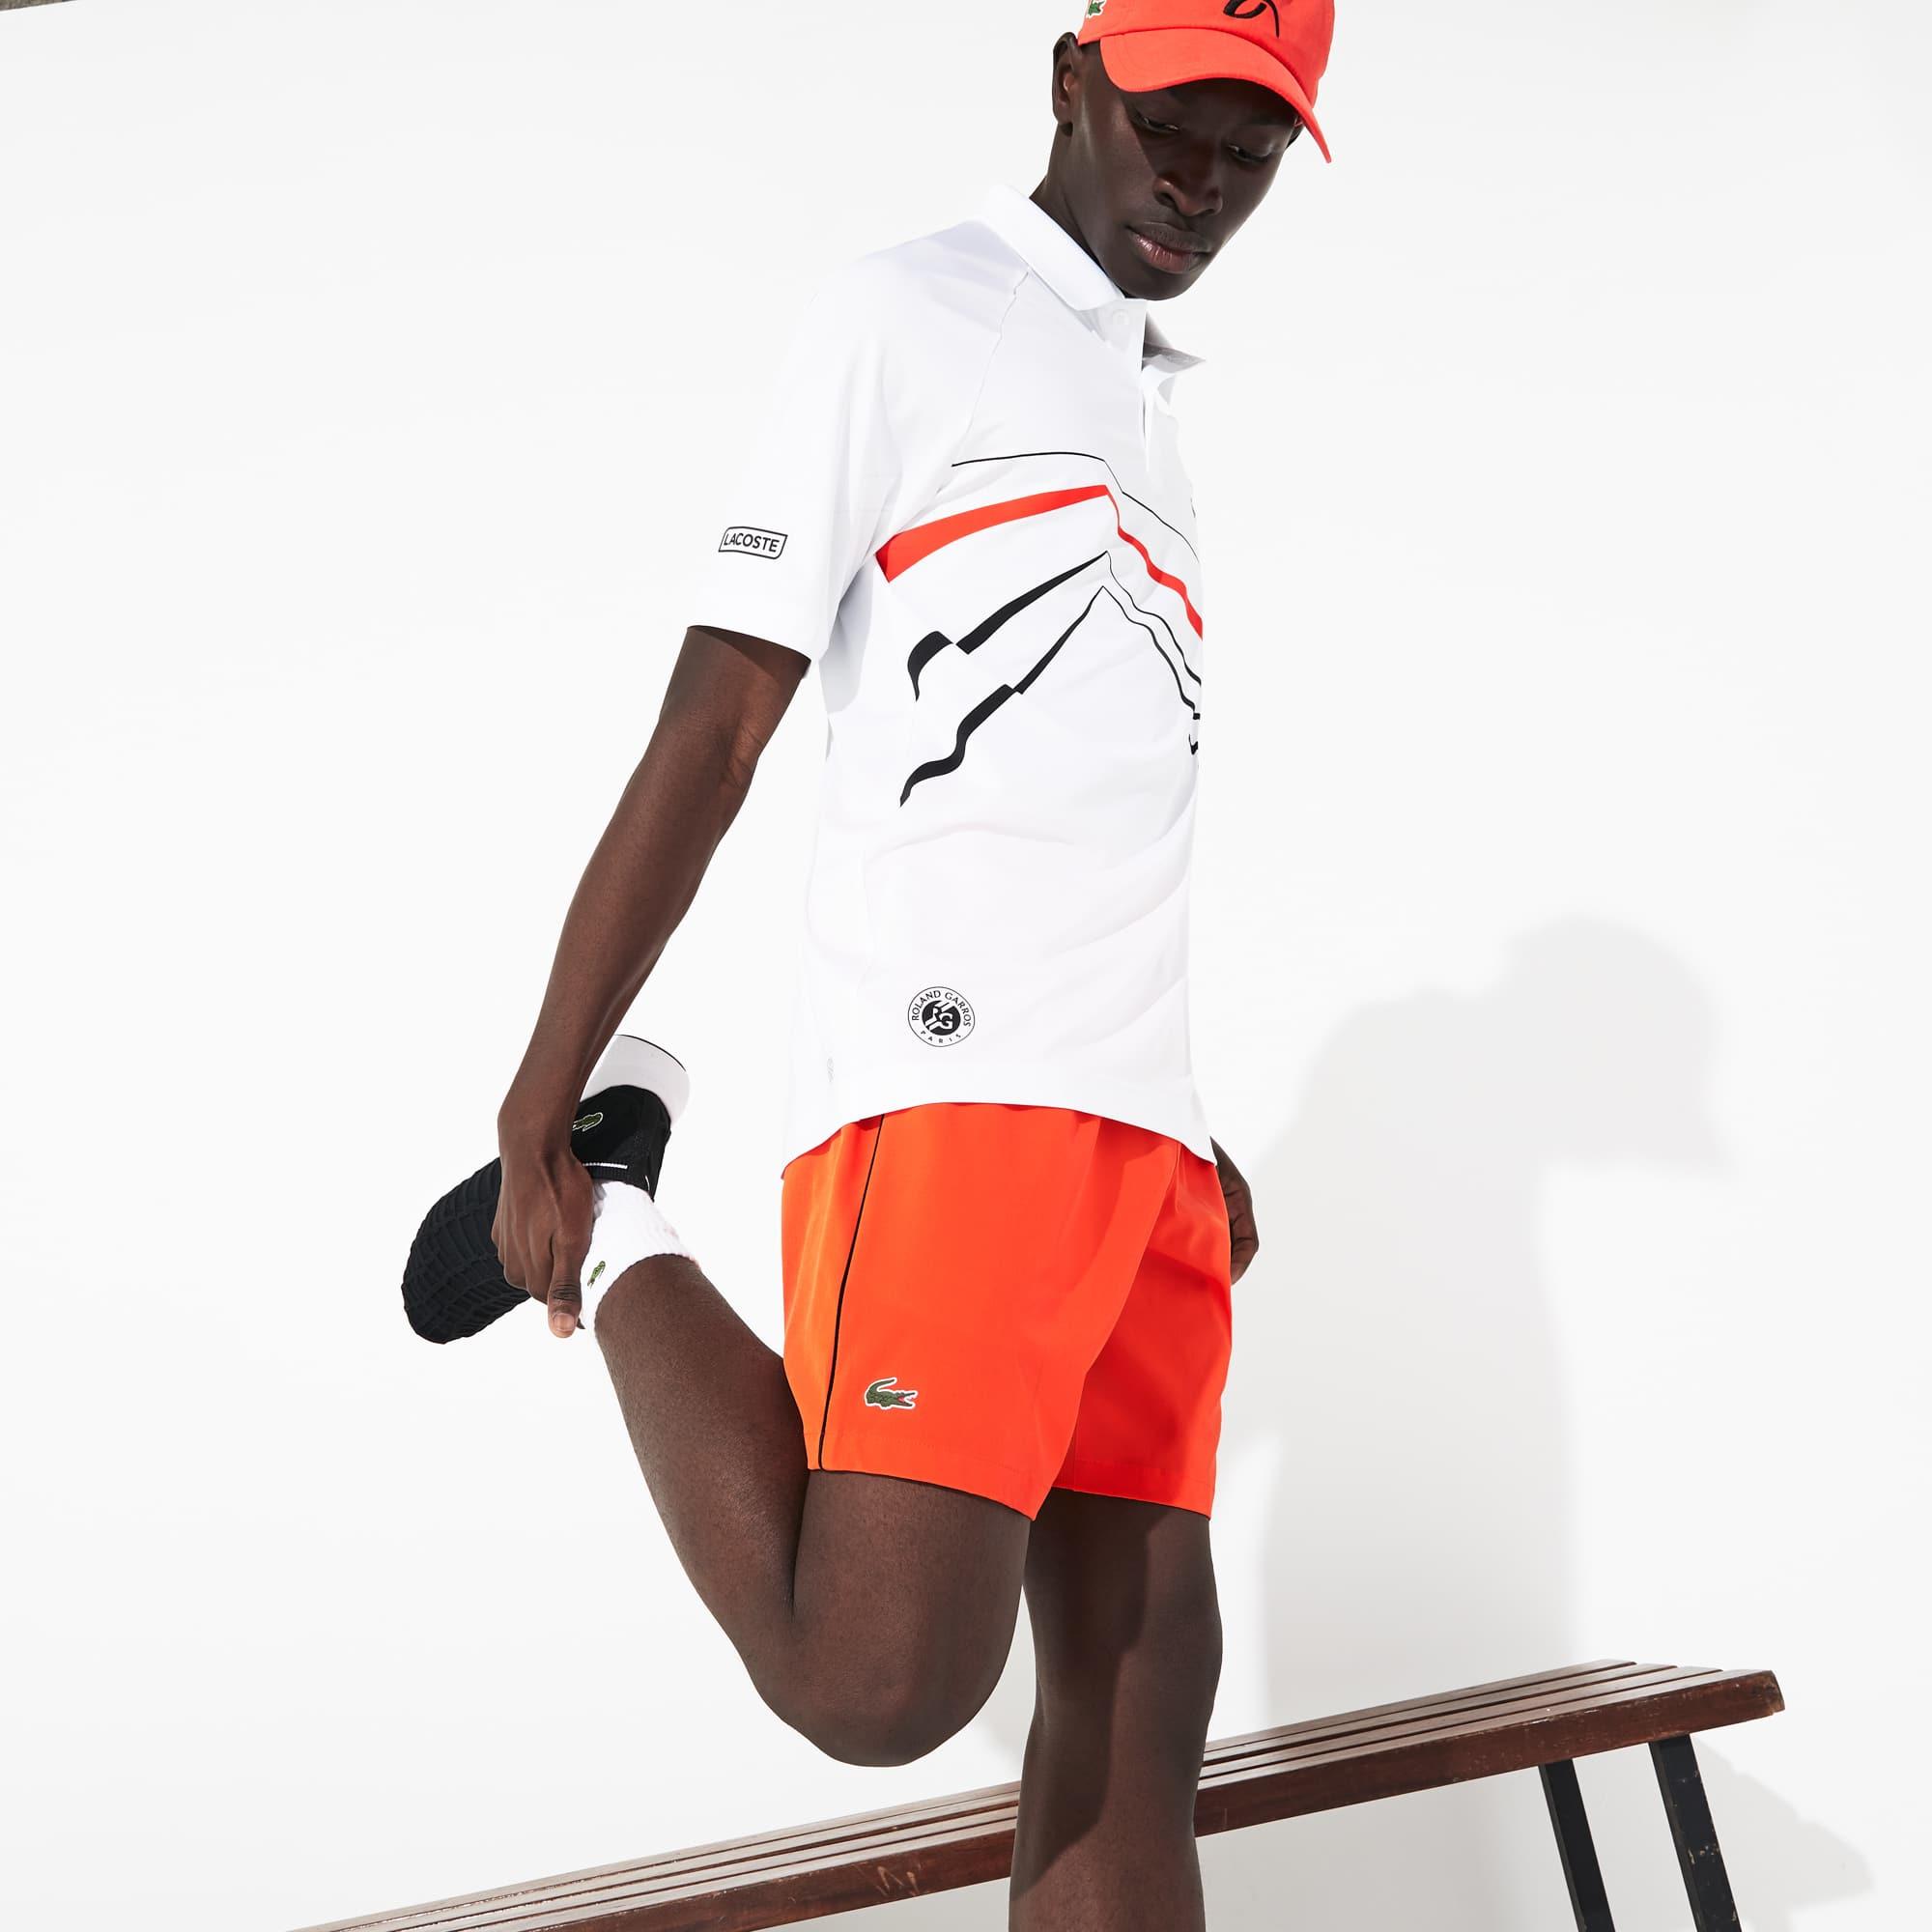 29147f481a51 Men's Lacoste SPORT Contrast Sleeves Ultra Light Cotton Polo Shirt. £45.00.  £75.00. + 1 colour